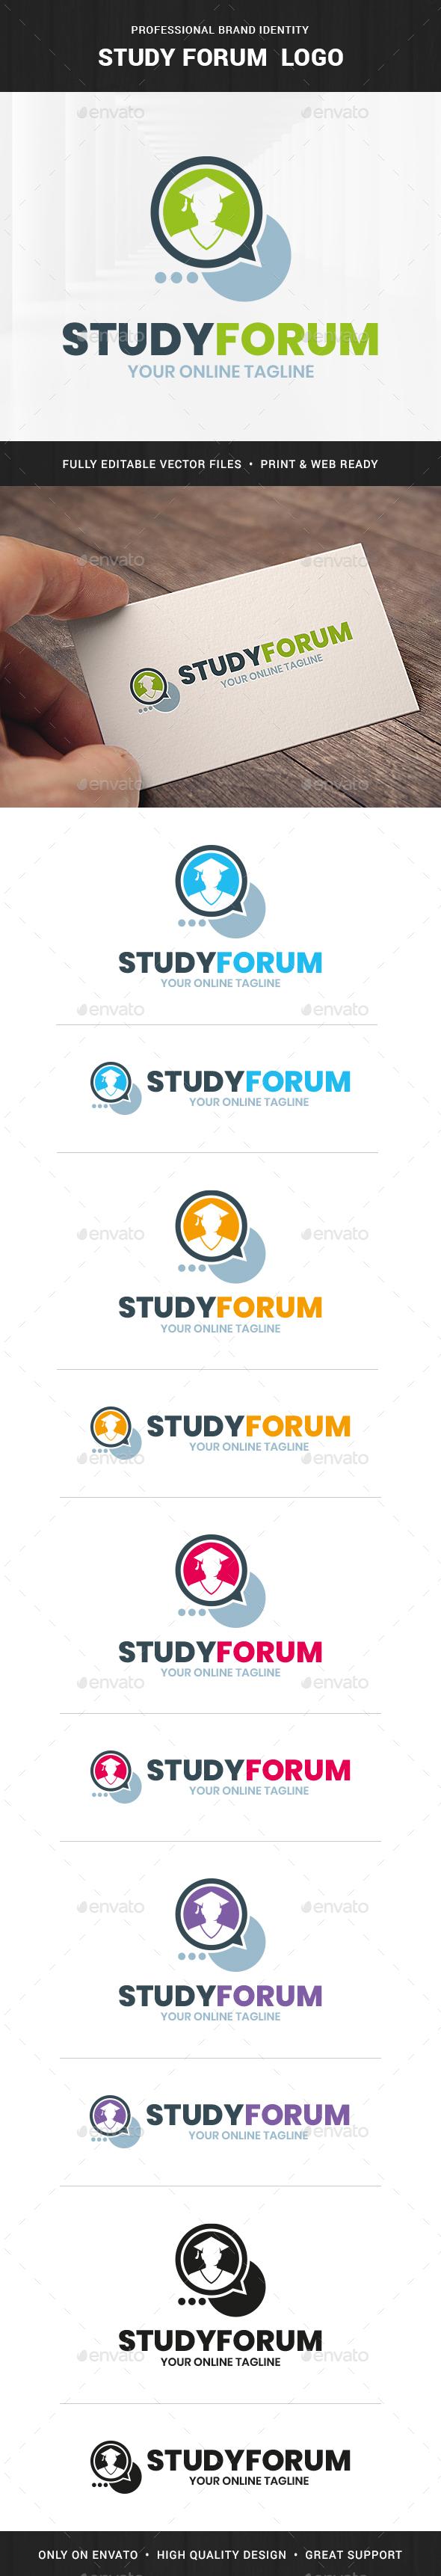 Study Forum Logo Template